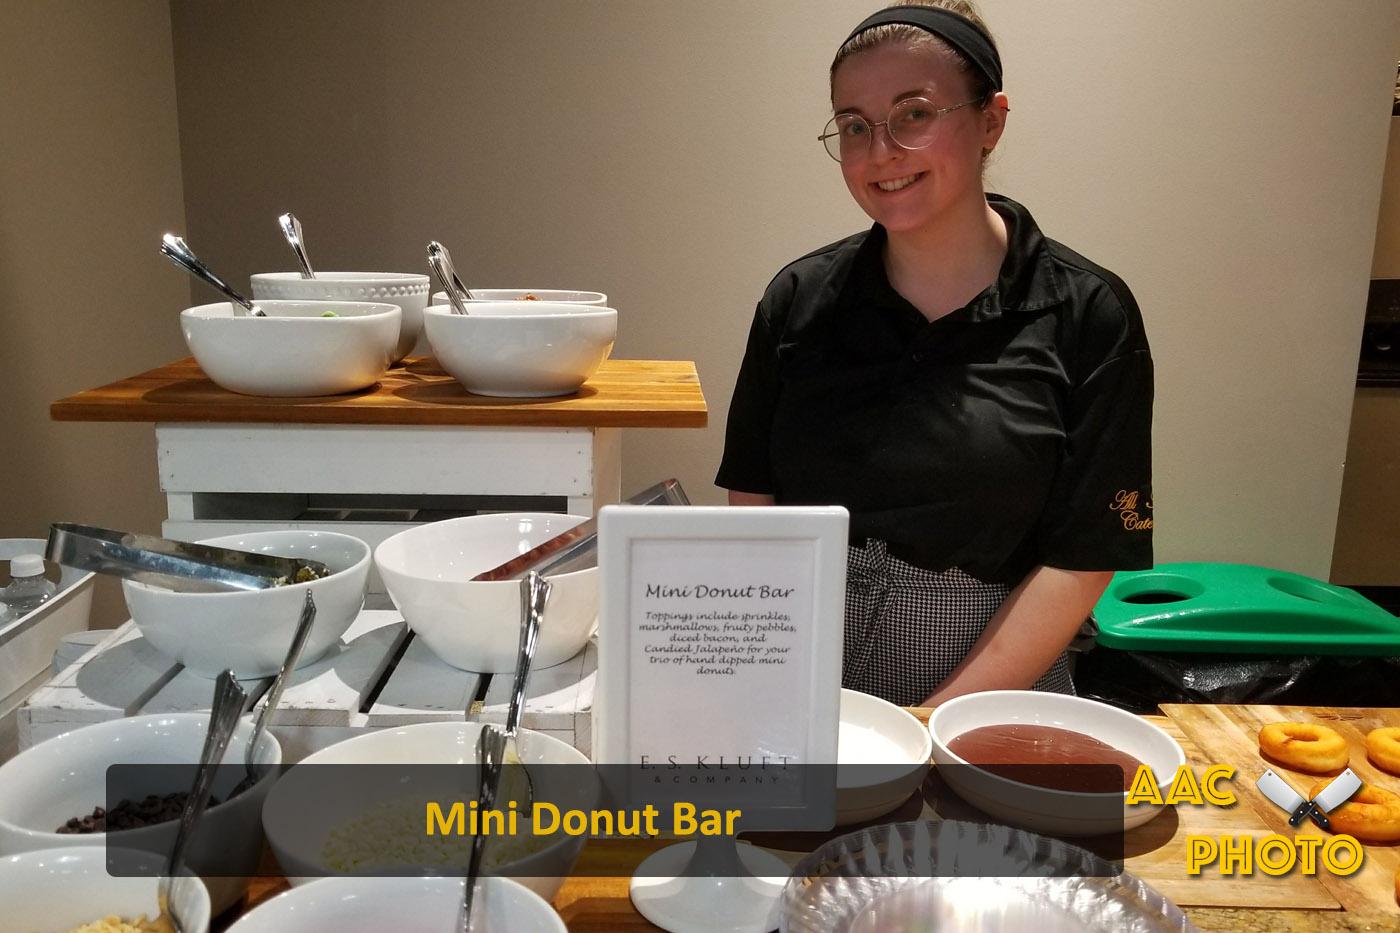 Mini Donut Bar